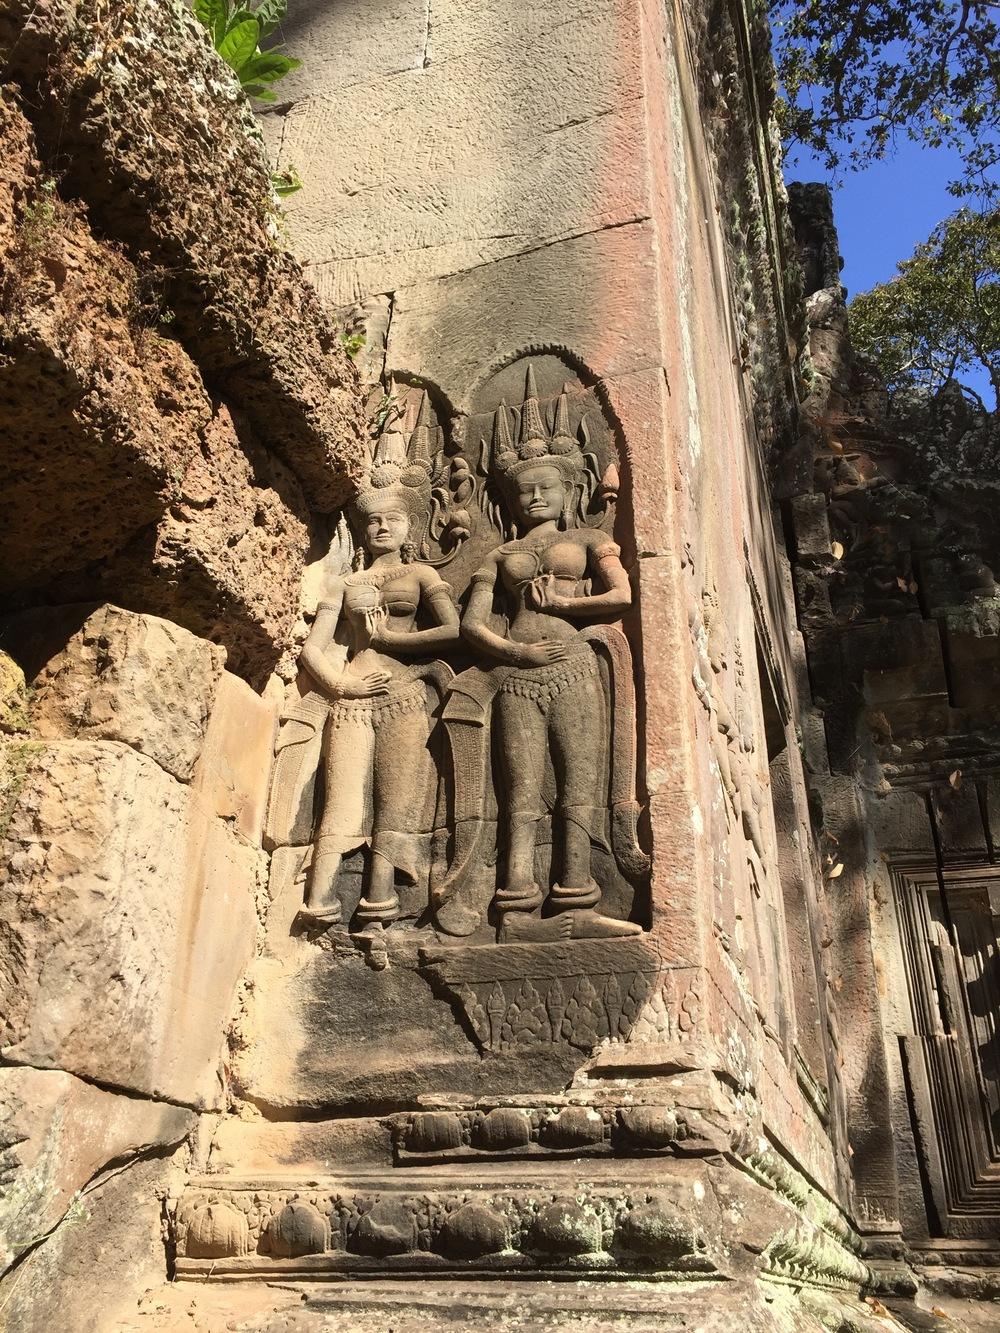 Exterior reliefs at Angkor Wat, Cambodia.